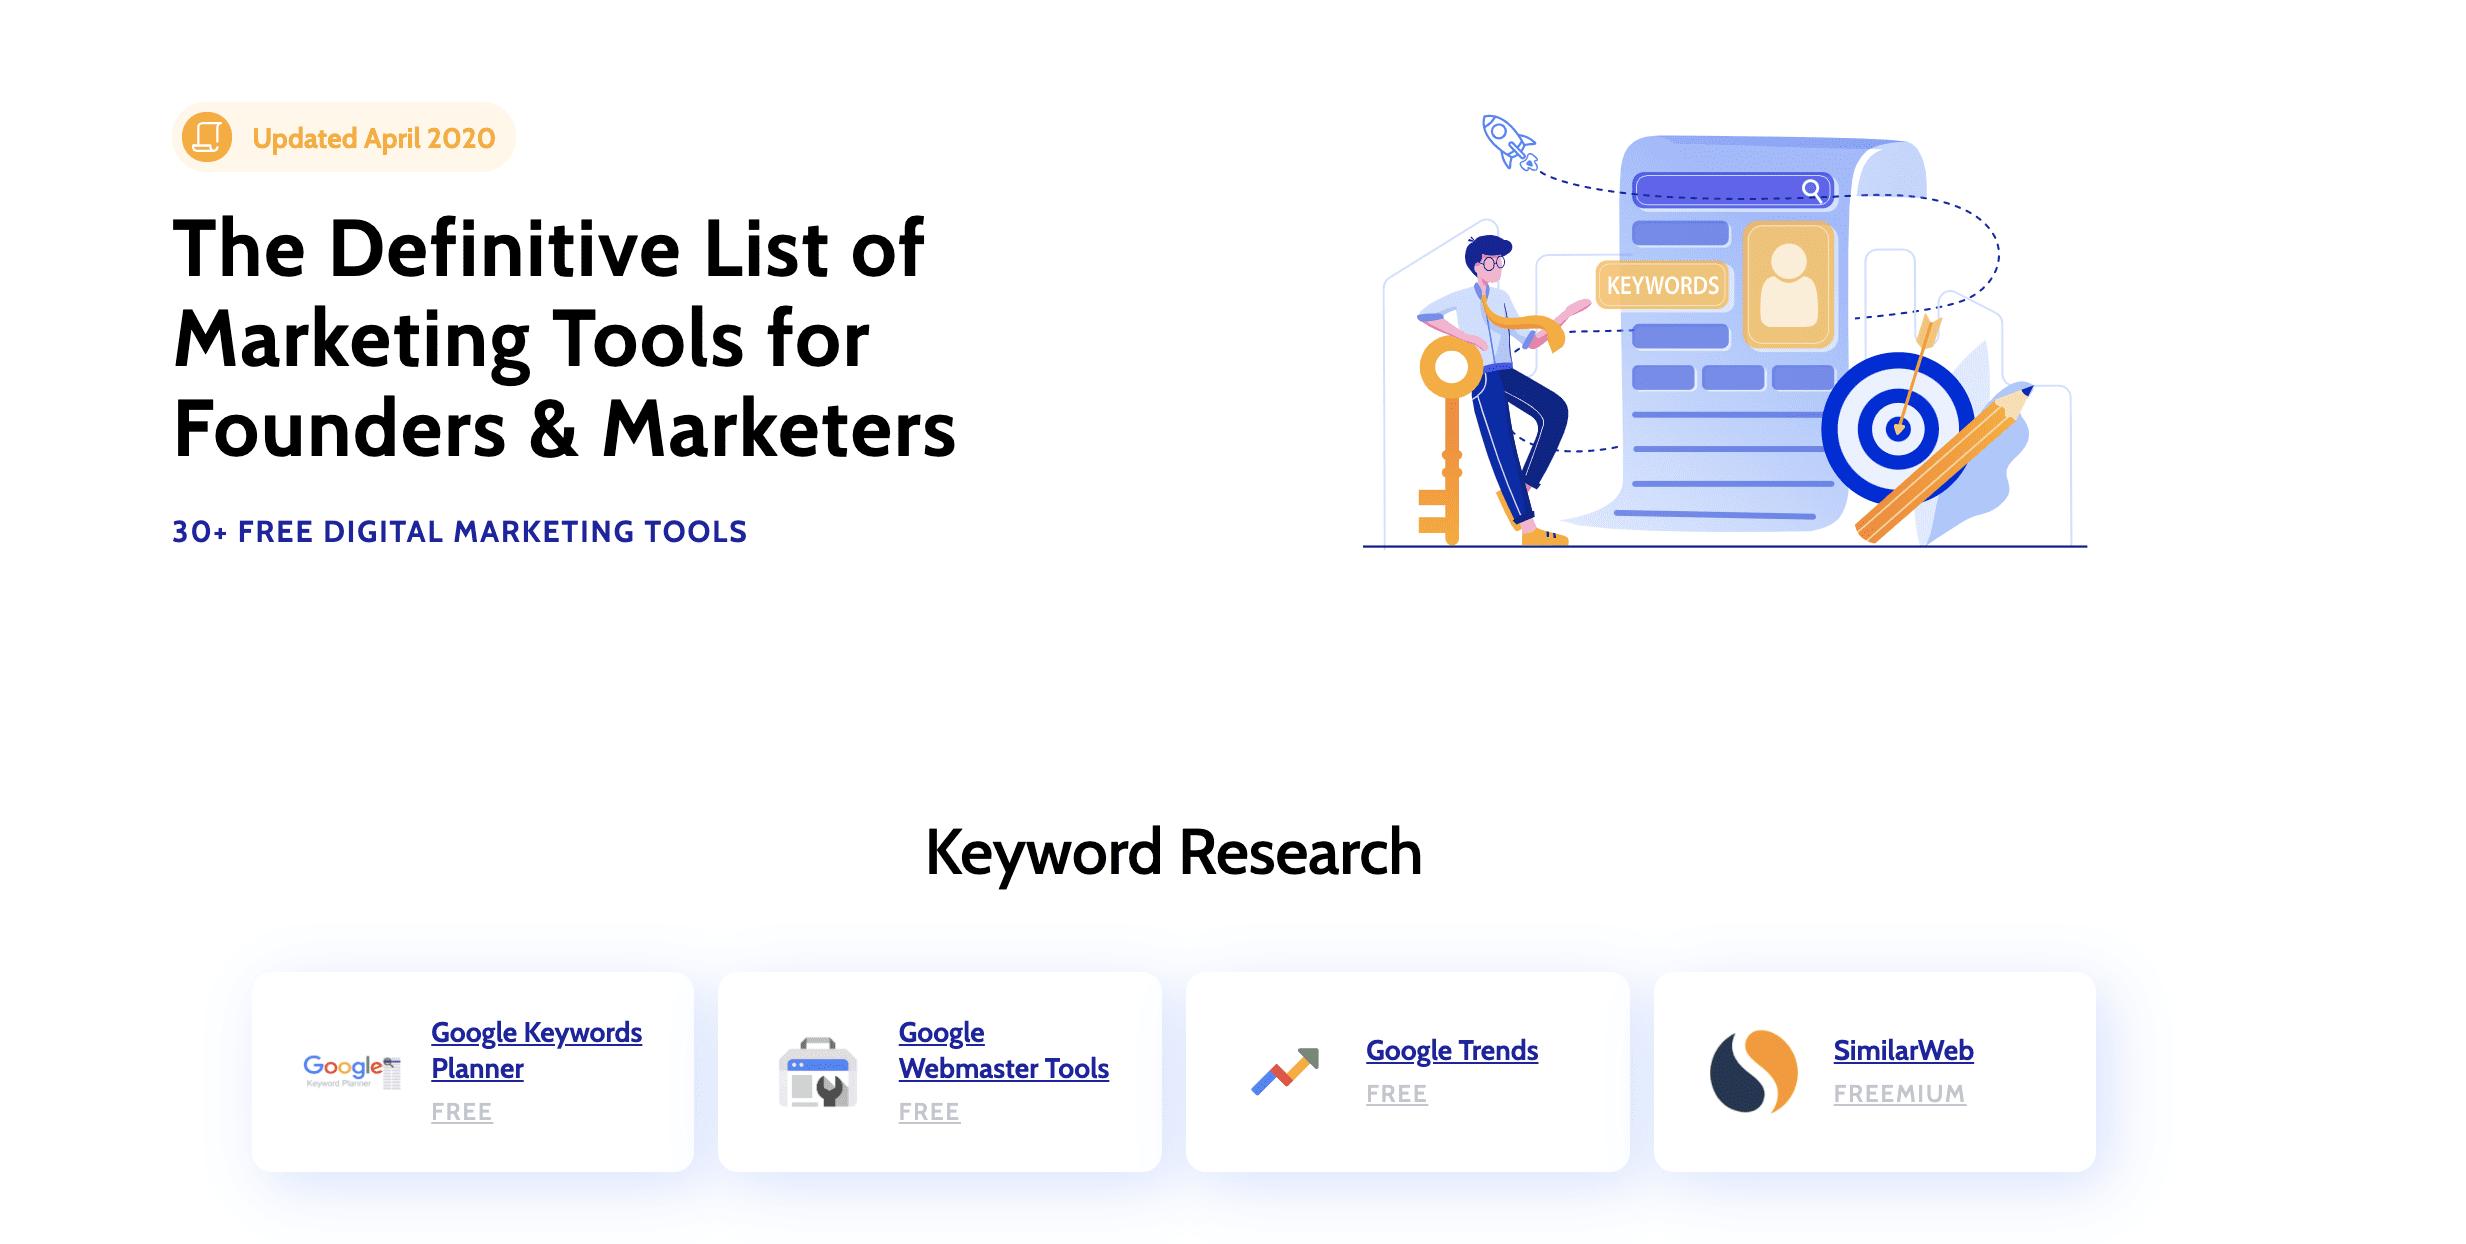 Screengrab of a content marketing tool